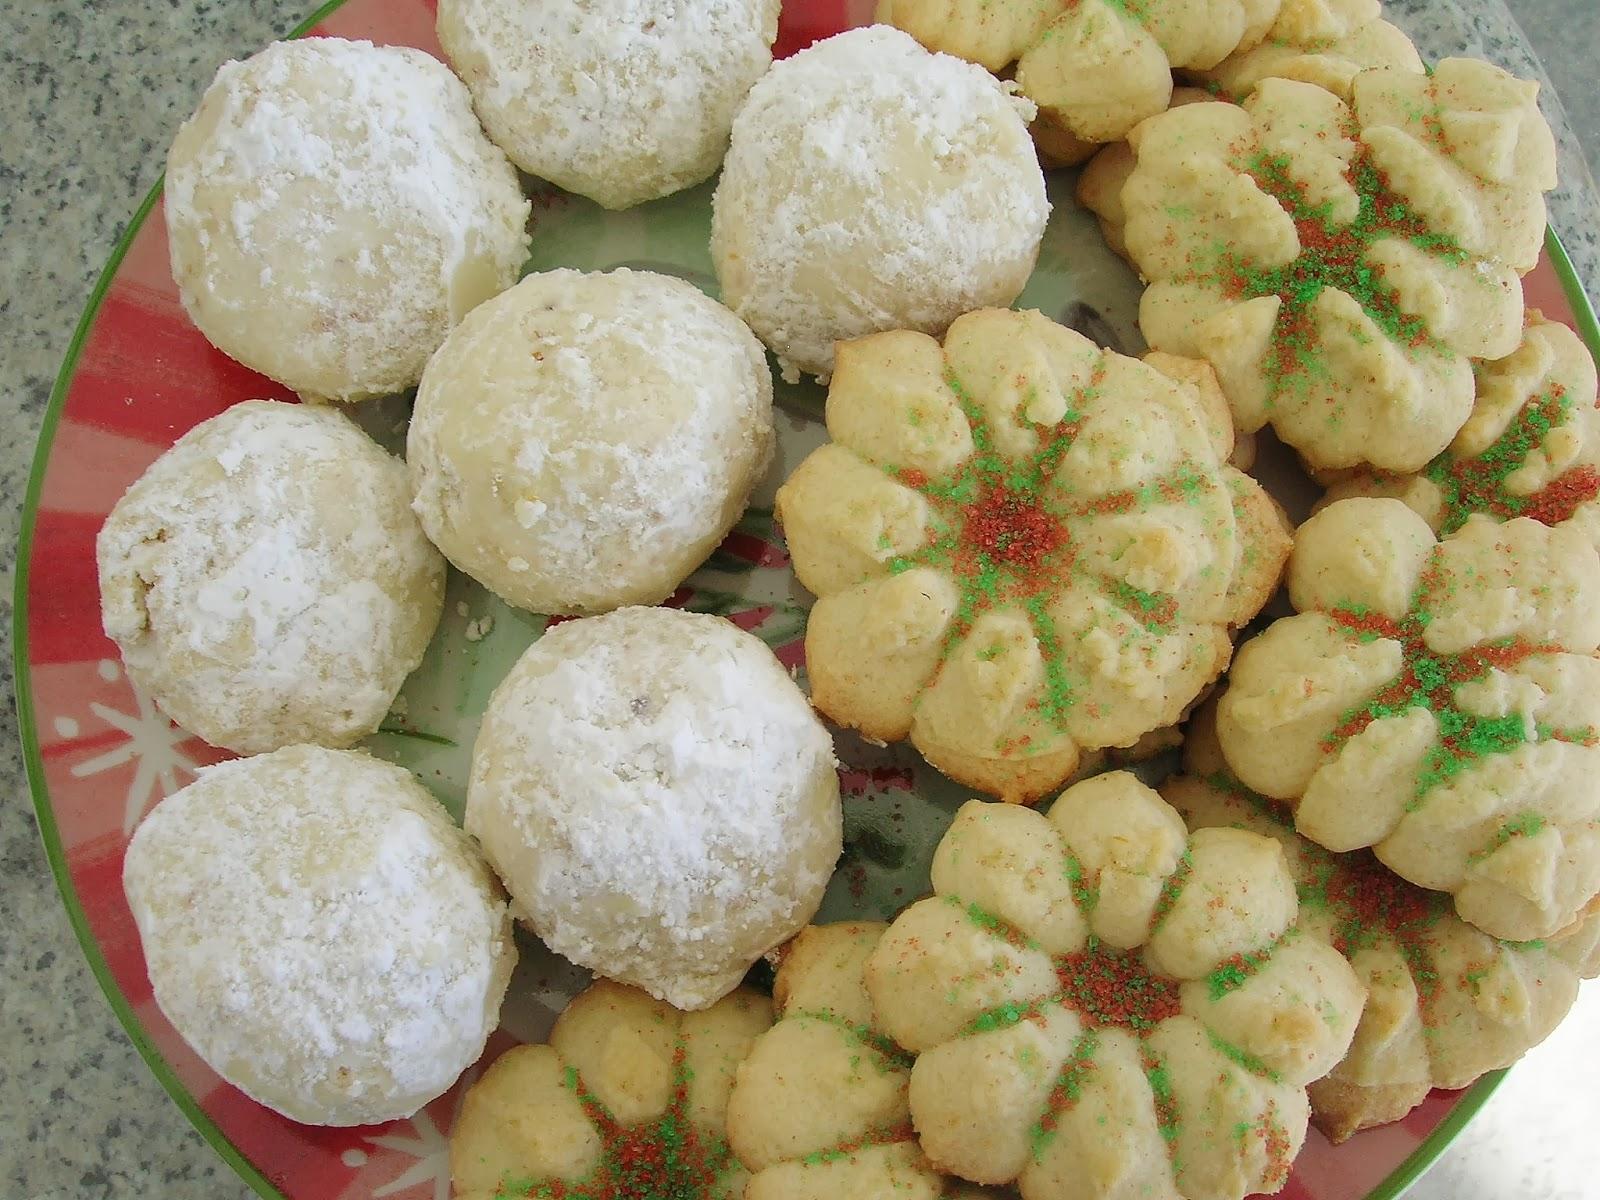 Skinny GF Chef : Gluten Free Spritz Christmas Cookies